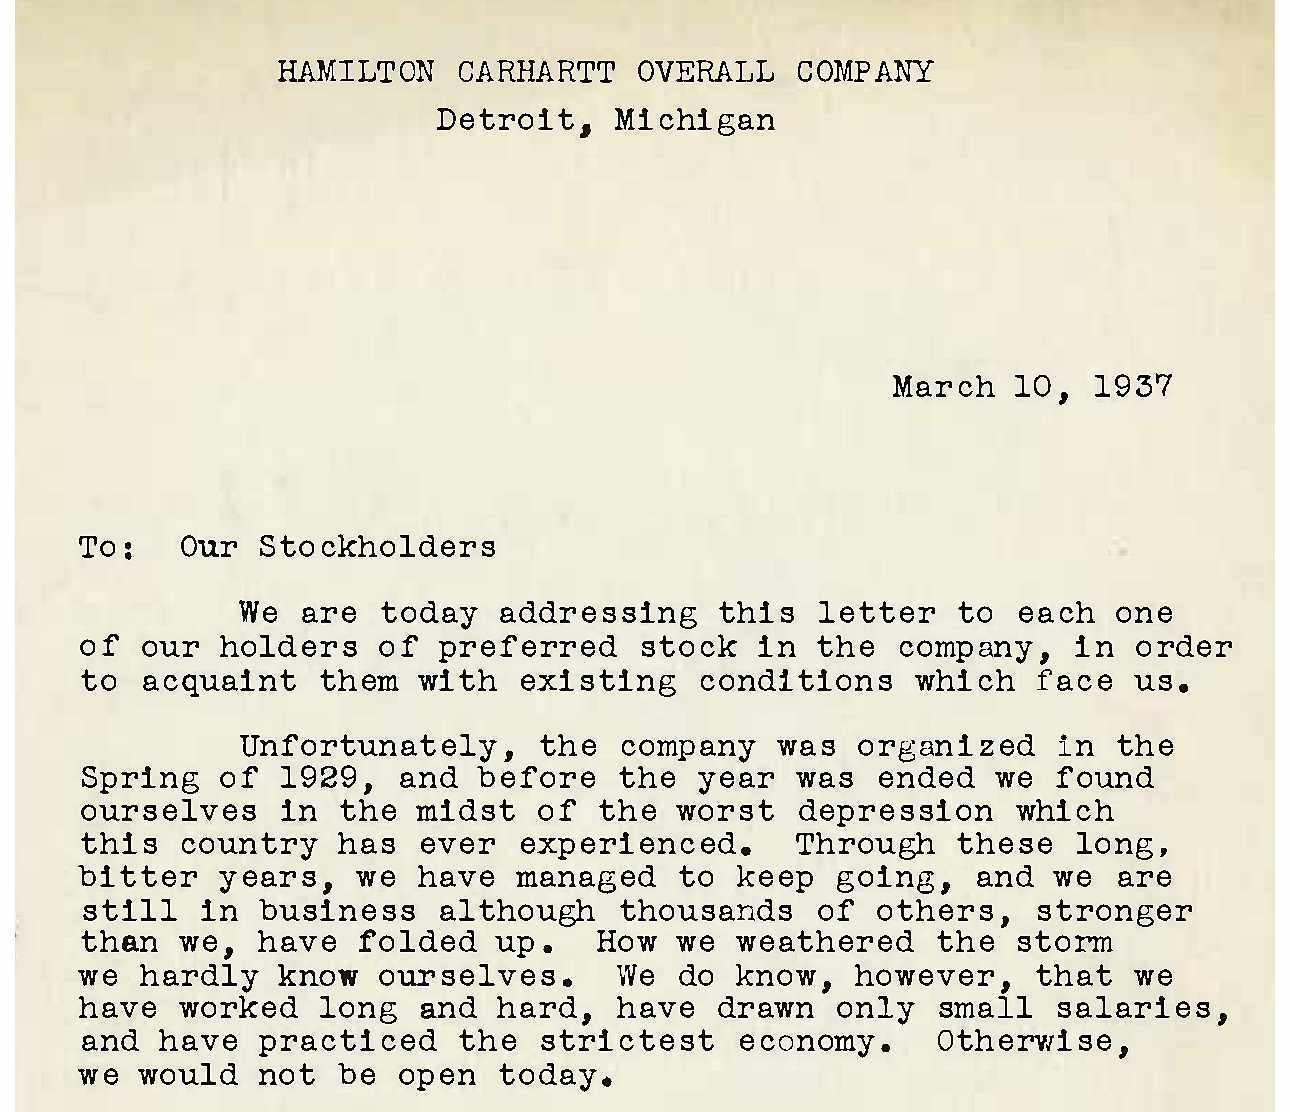 Letter to stockholders describing financial setbacks, 1937